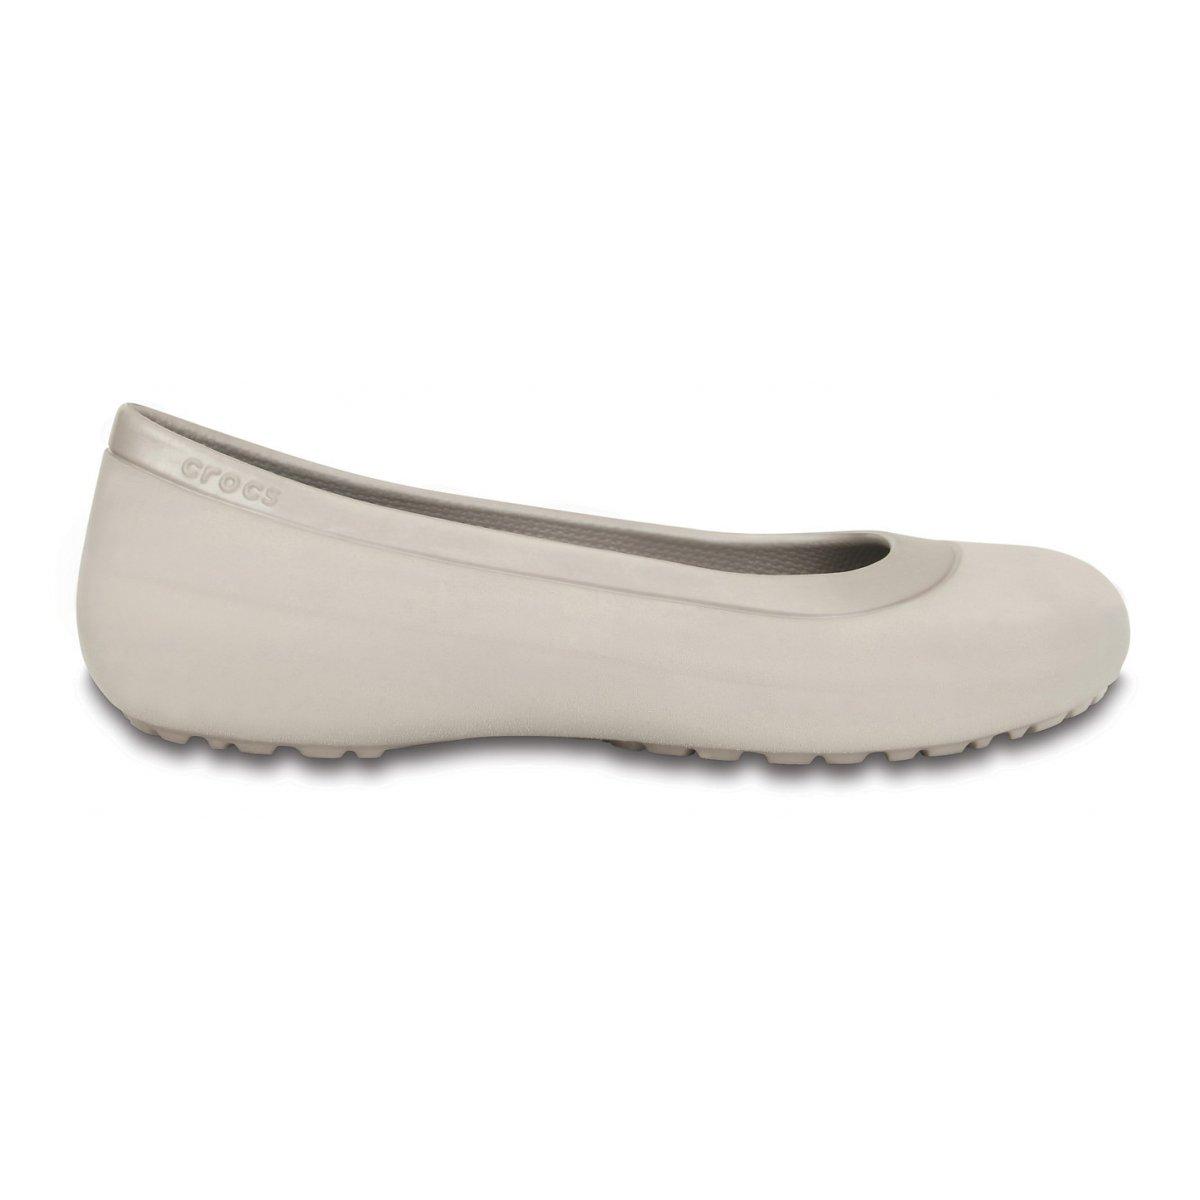 fc6cf375d6108 Mammoth Leopard Lined Flat Women - Collezione a i Footwear Donna ...